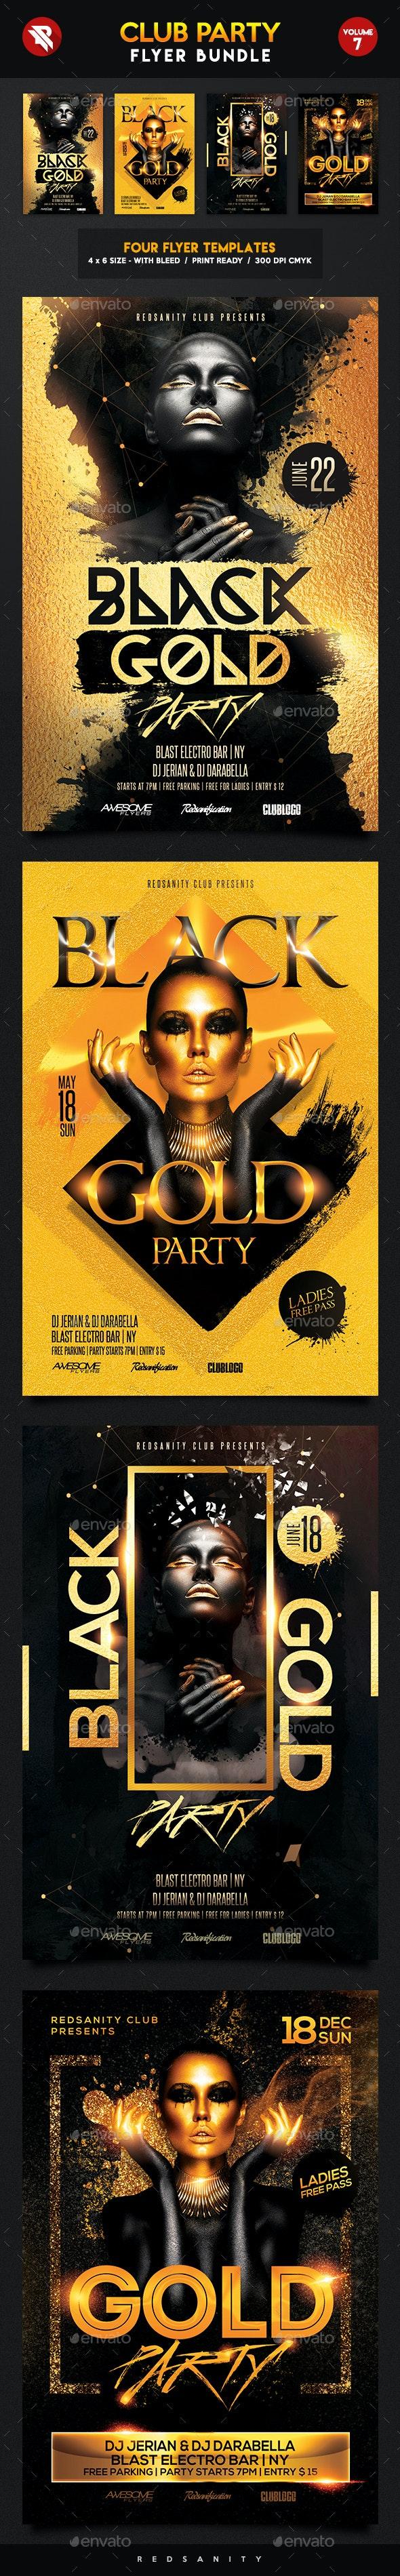 Club Flyer Bundle Vol.7 - Clubs & Parties Events